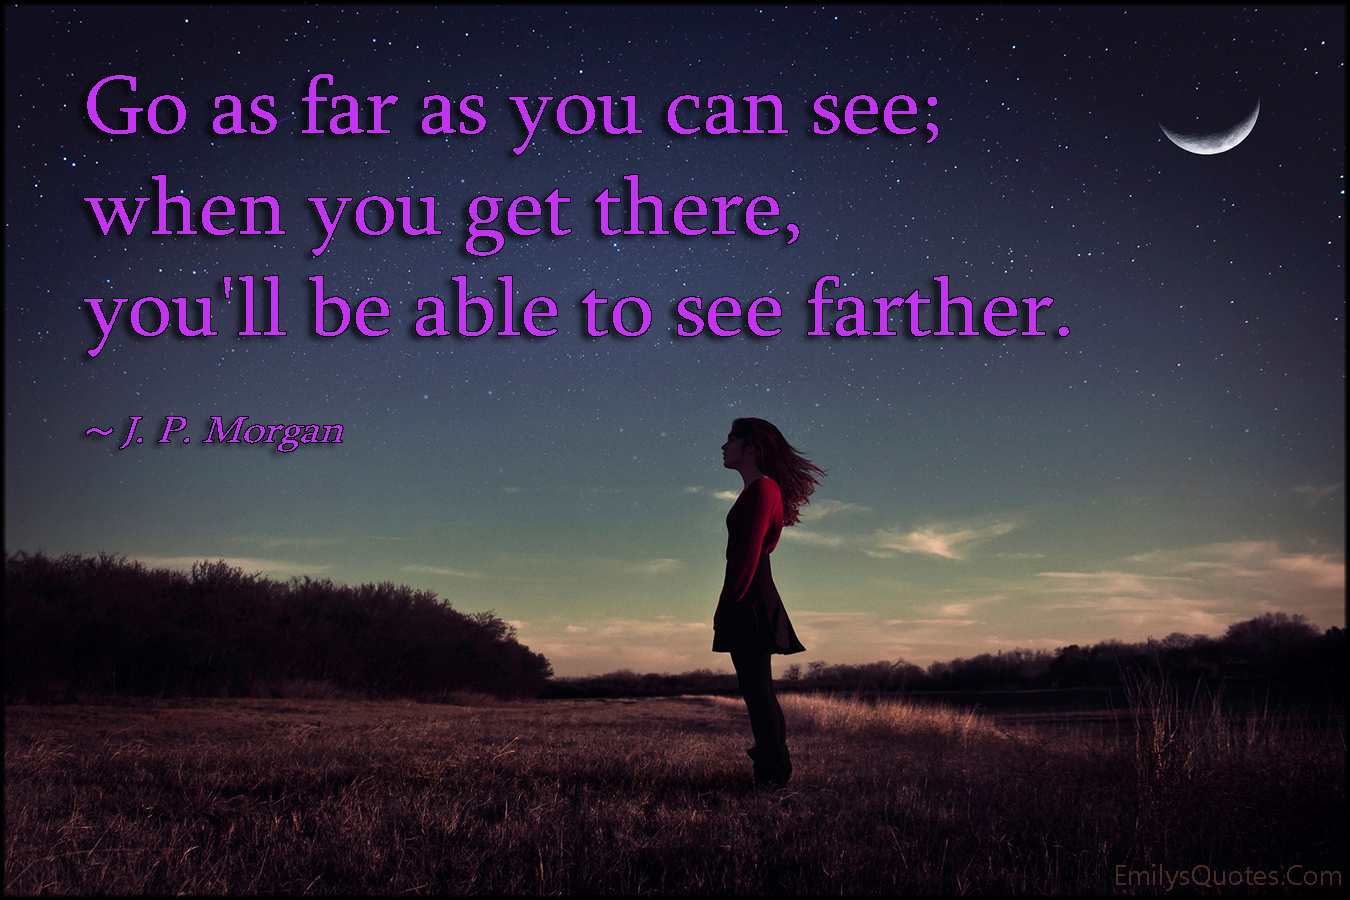 EmilysQuotes.Com - amazing, great, inspirational, go, far, see, farther, encouraging, J. P. Morgan